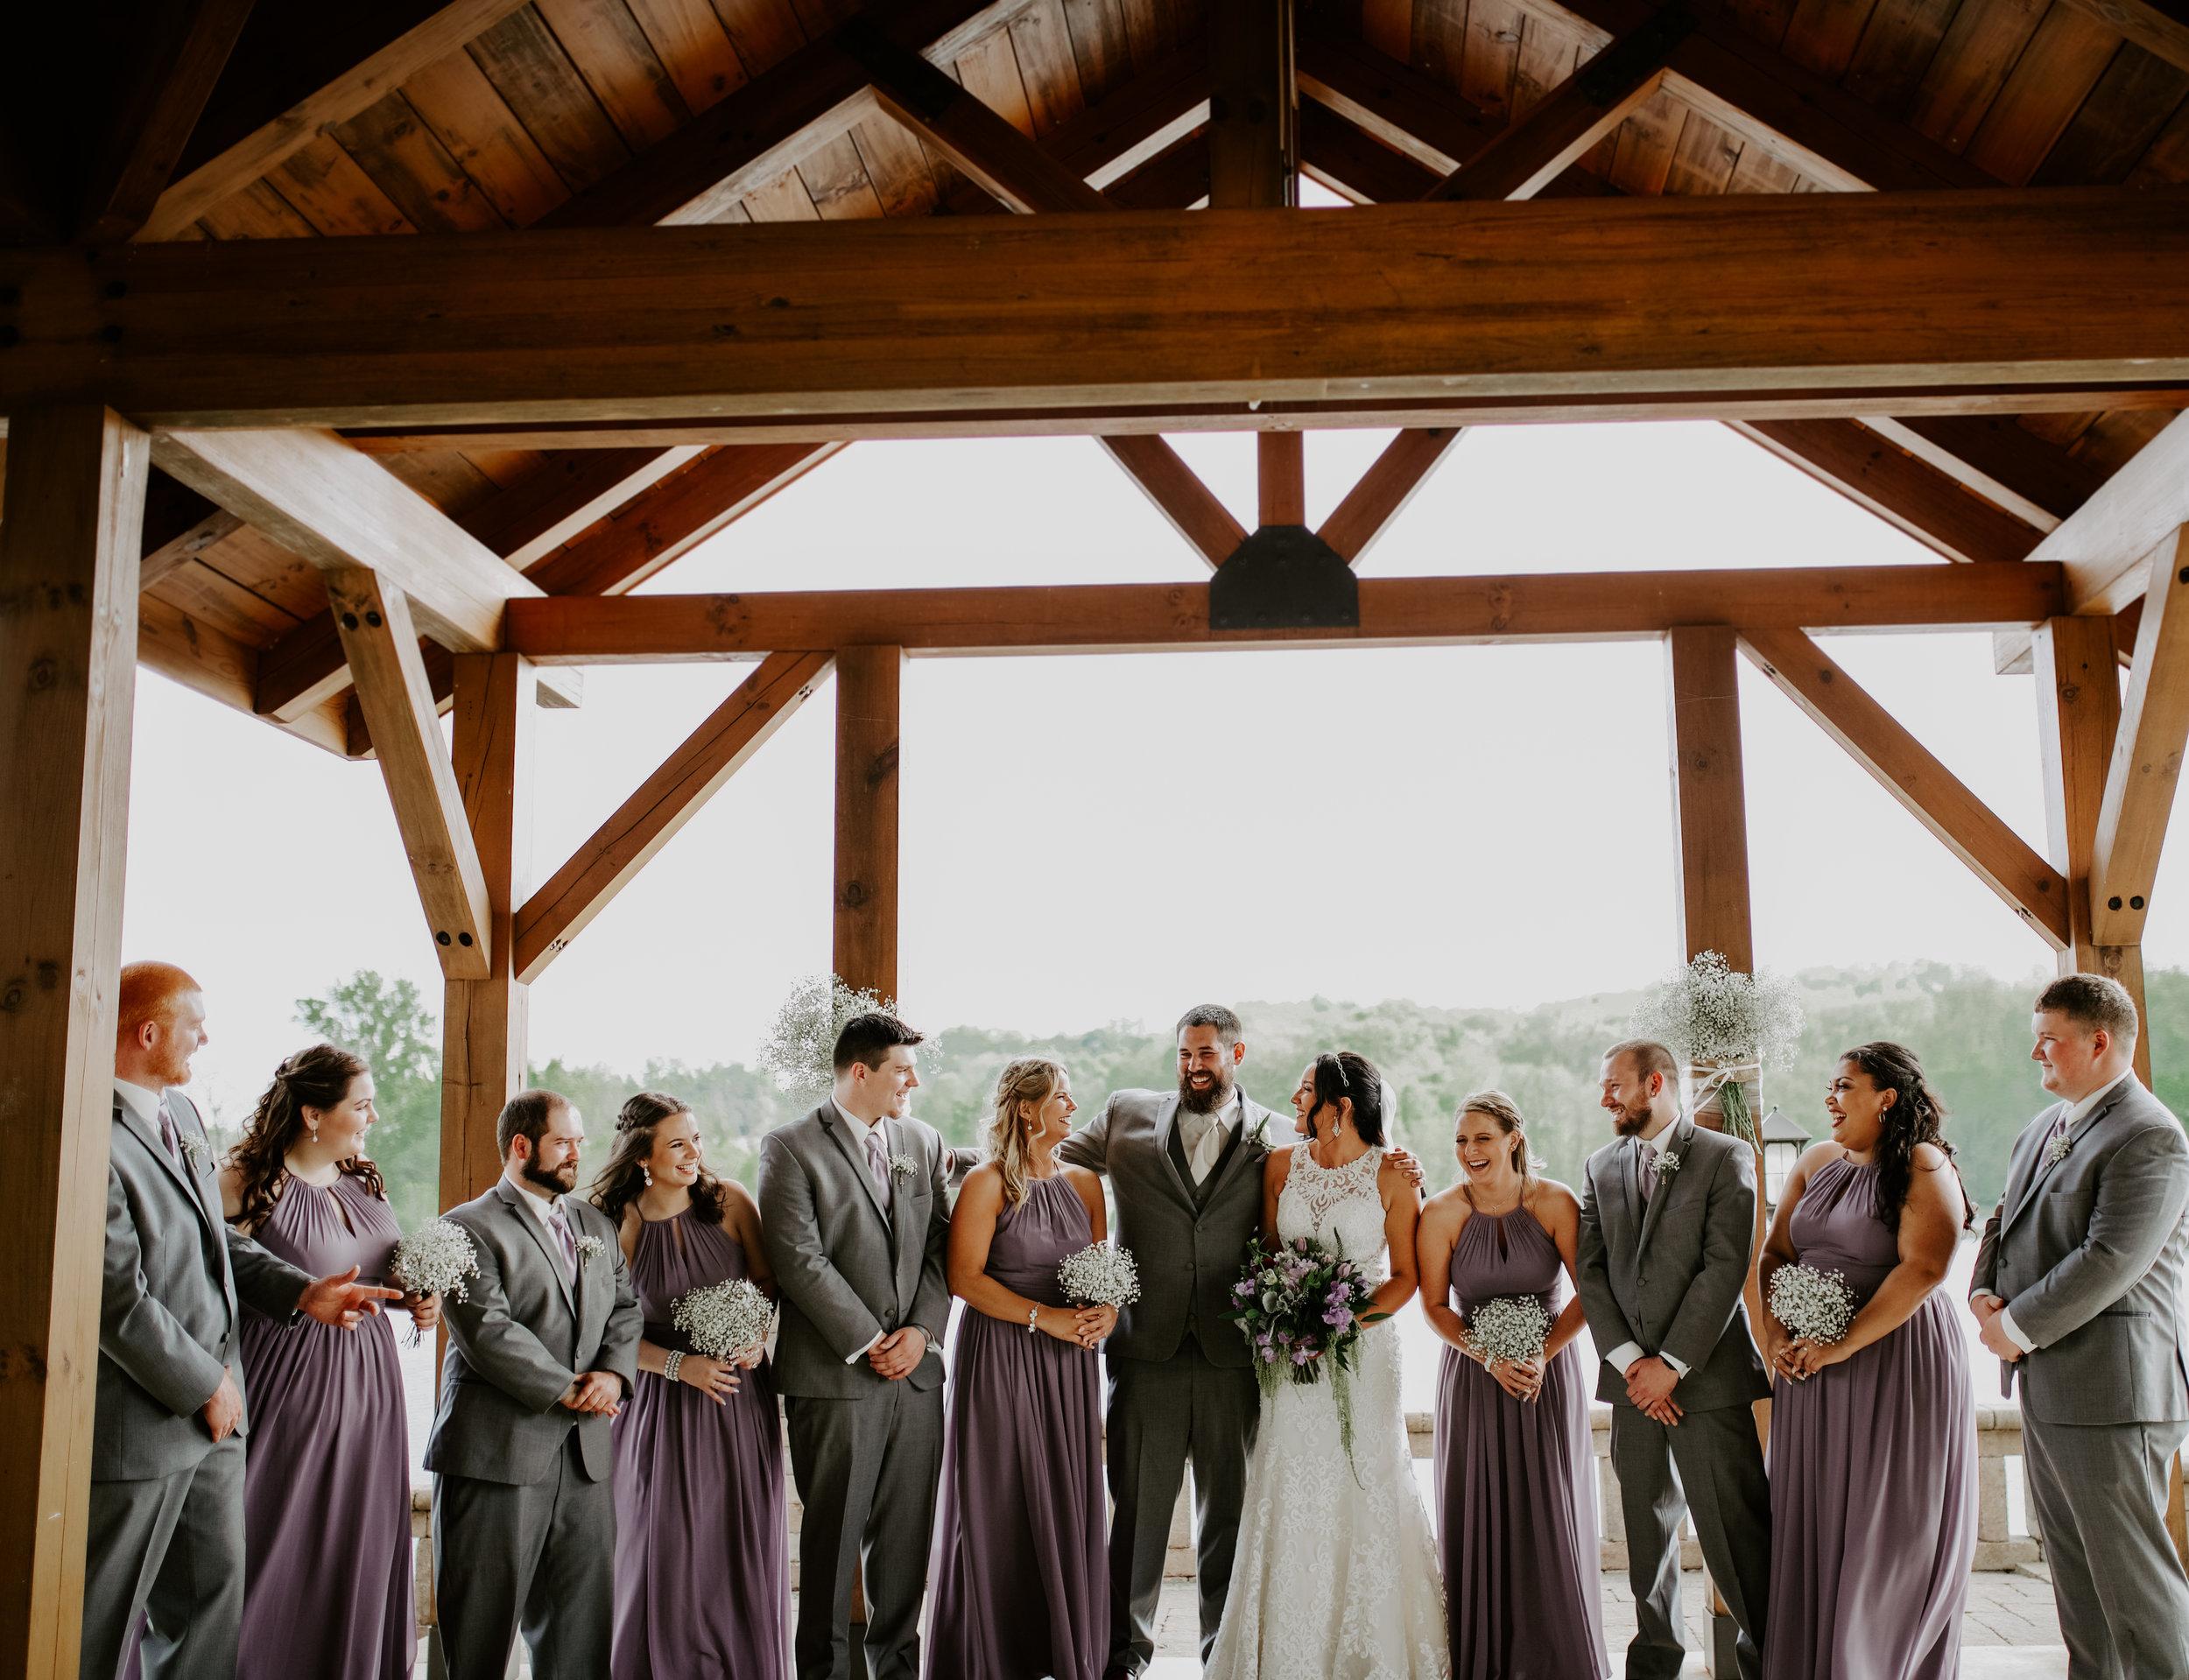 Kylei + Jordan wedding 170 (1 of 1).jpg